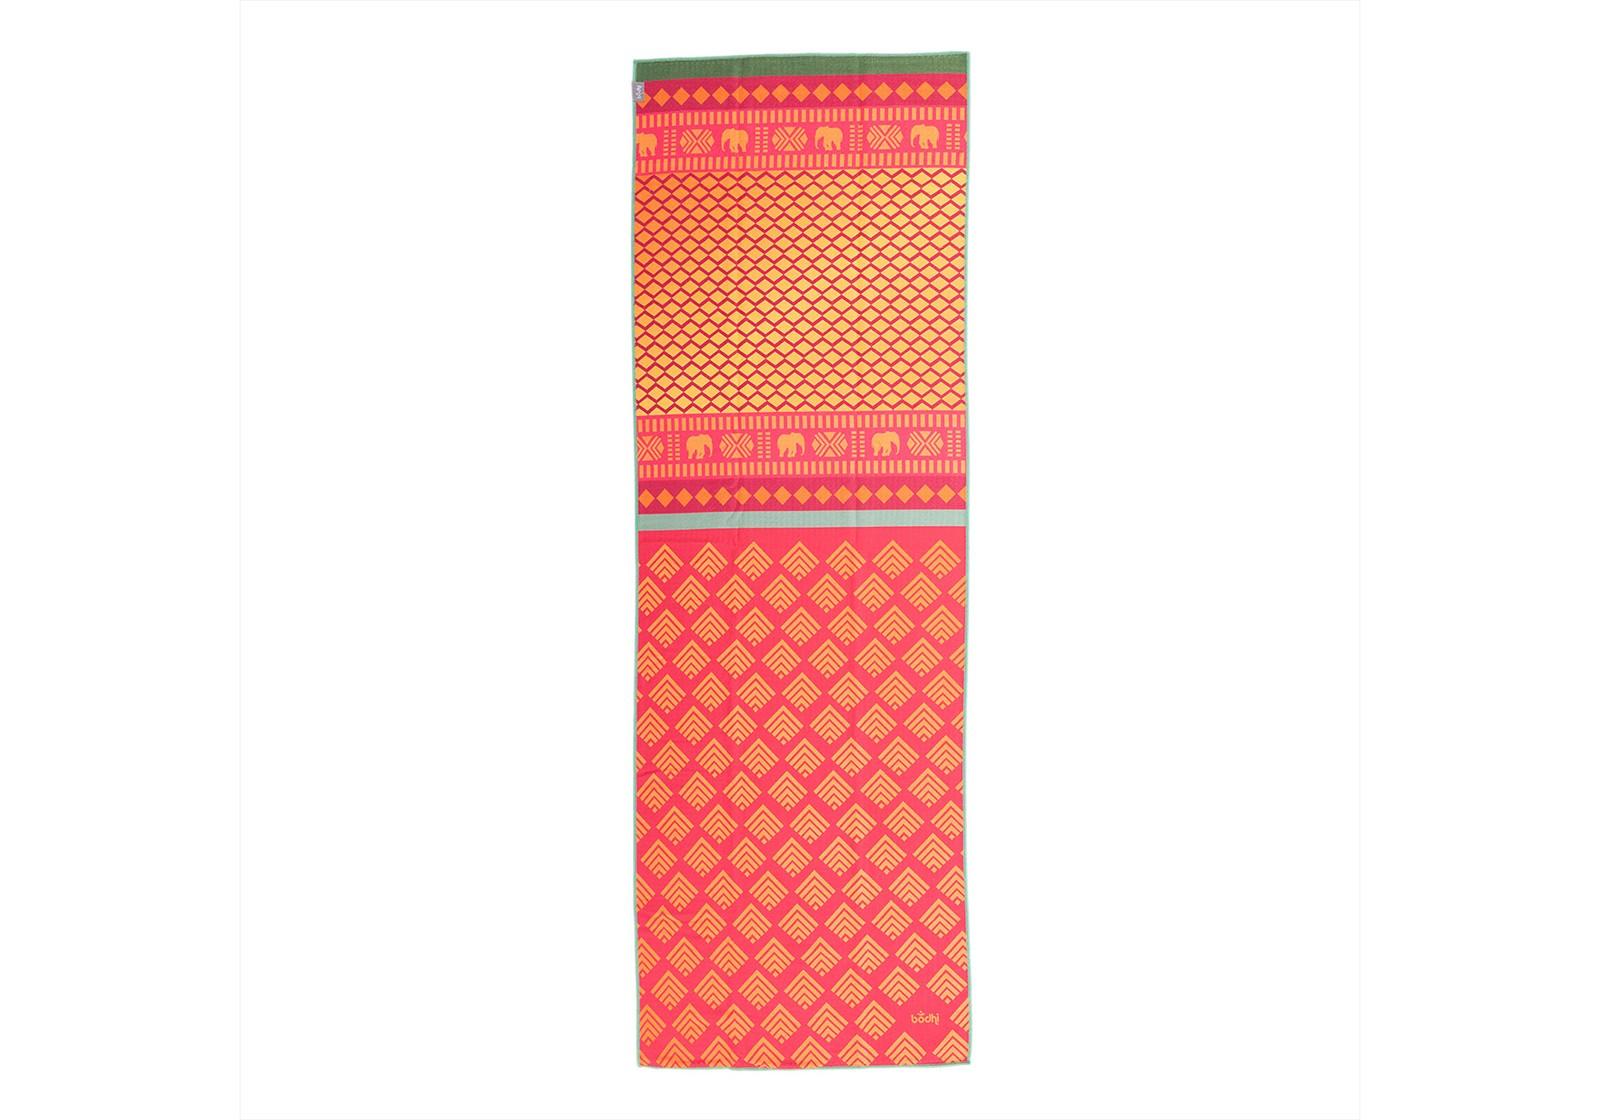 polotence-dlja-jogi-safari-sari-bodhi-ot-bodhi-185×61-sm01